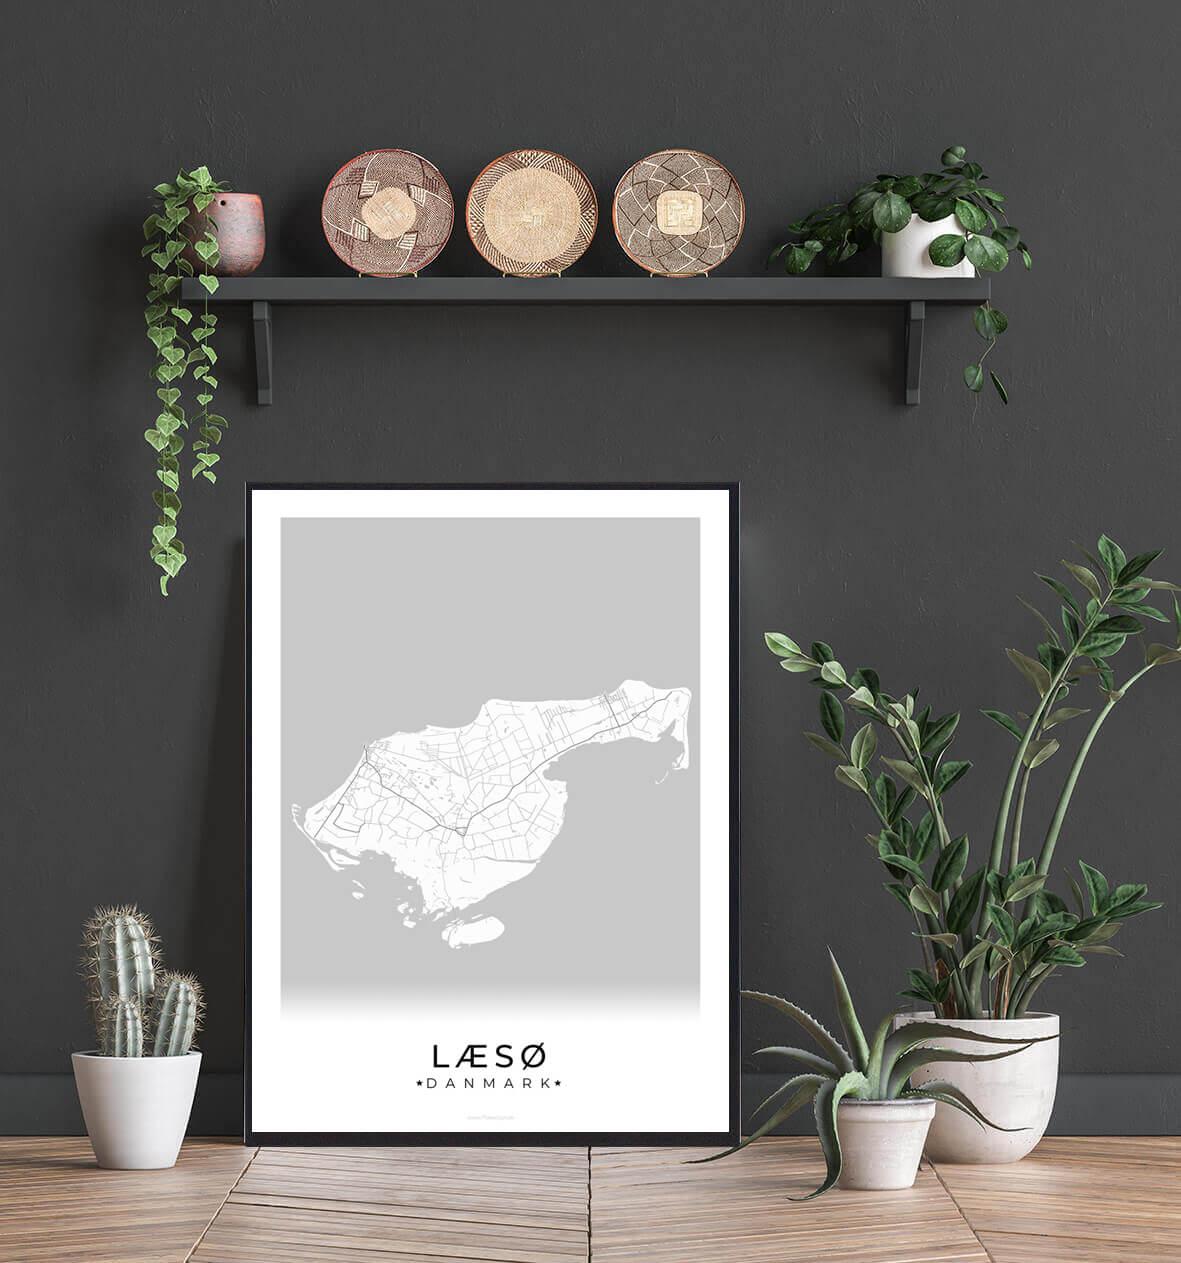 Laesoe-plakat-omraade-hvid-2